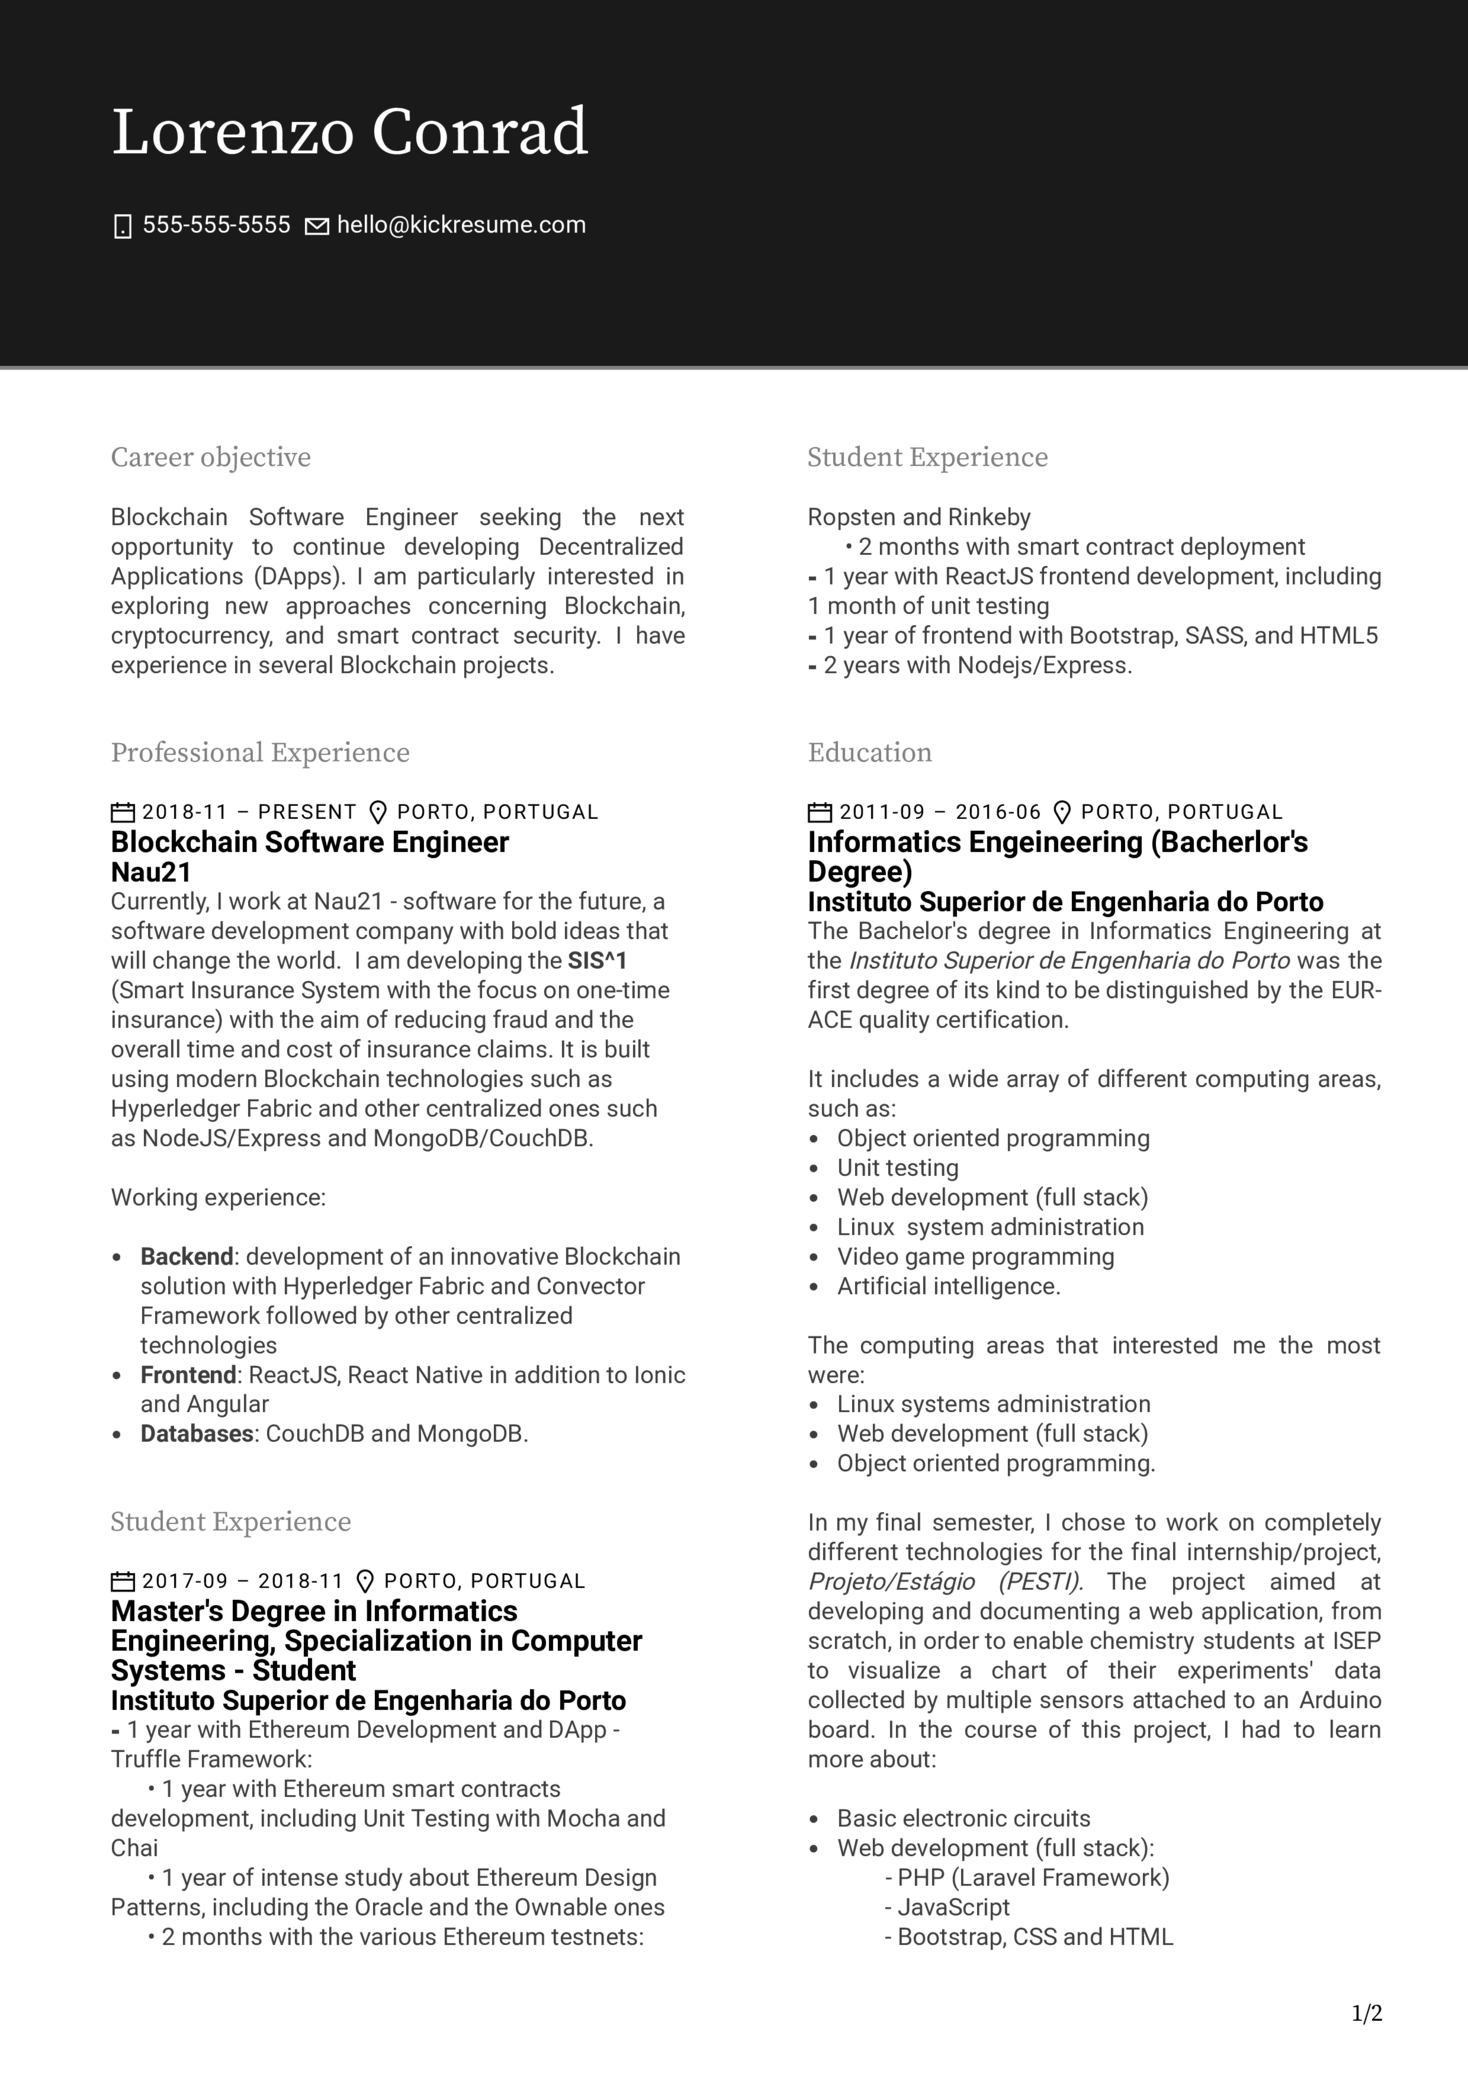 Nau21 Software Engineer Resume Example (Part 1)